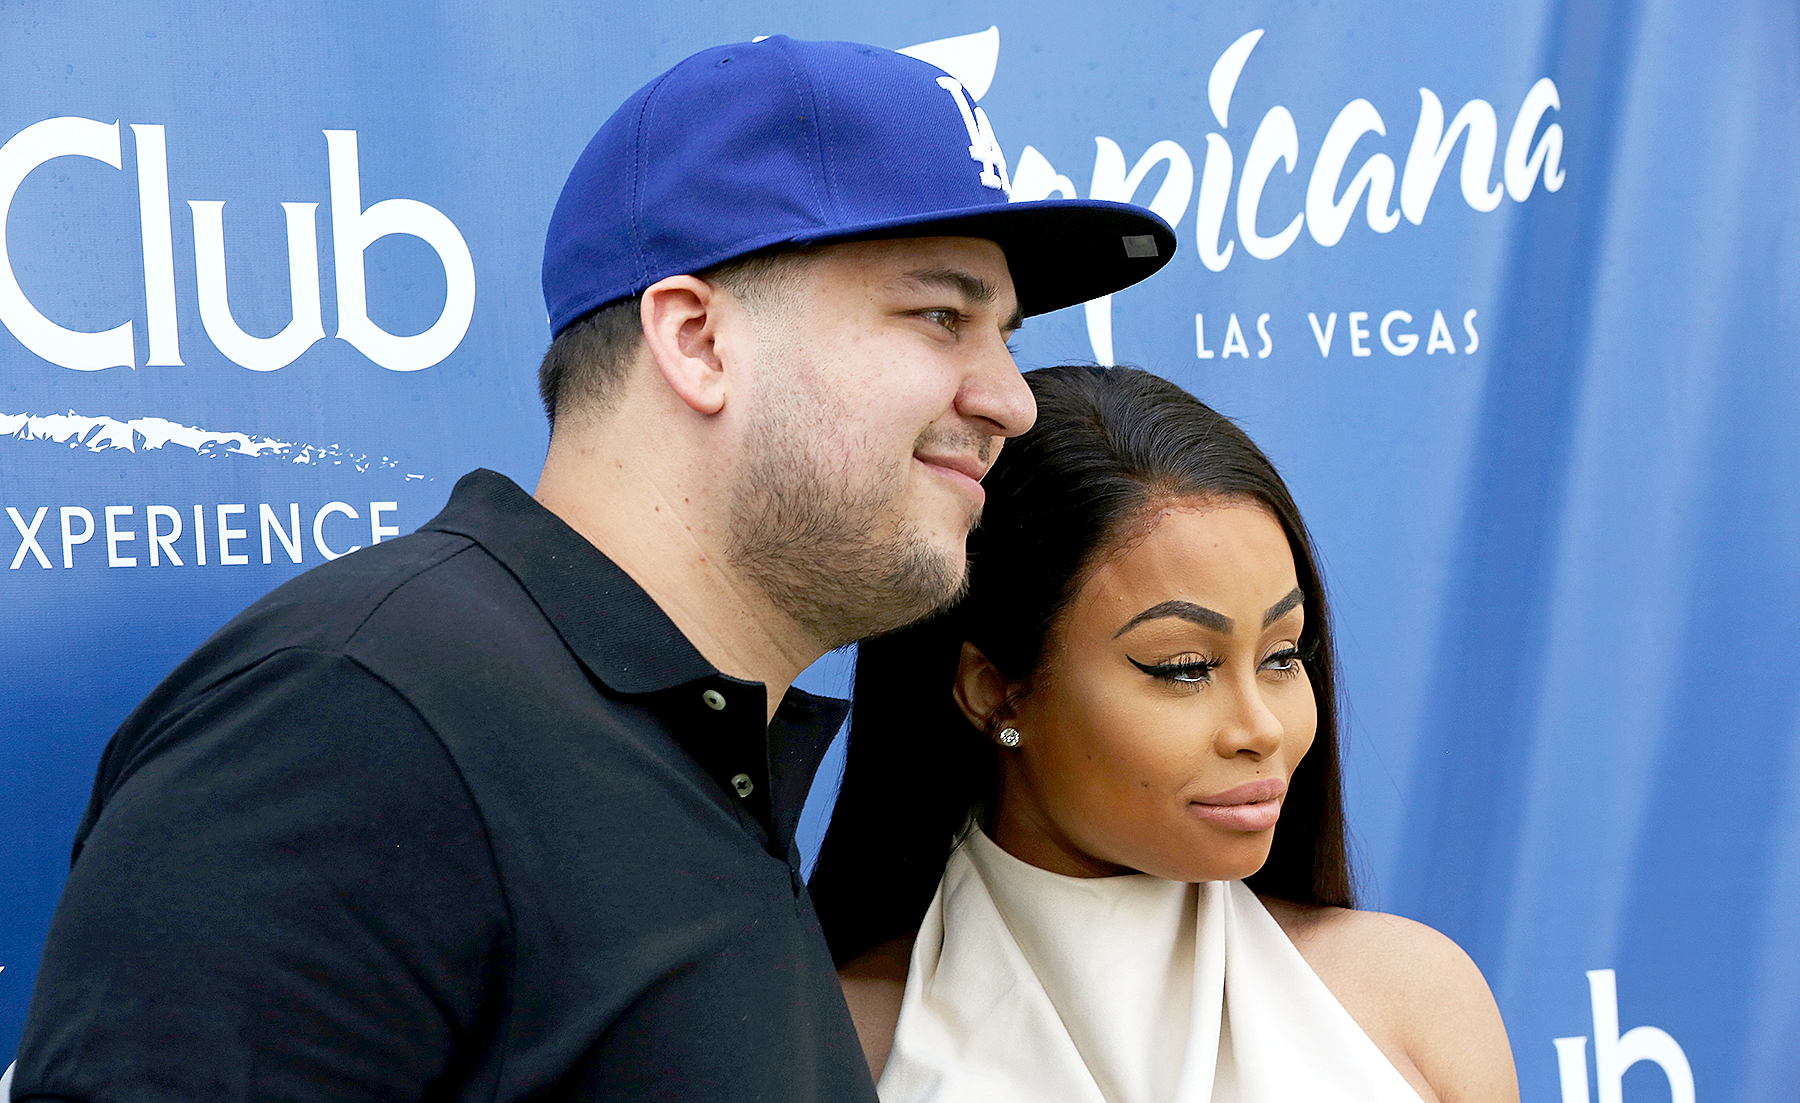 Rob Kardashian and Blac Chyna attend the Sky Beach Club at the Tropicana Las Vegas on May 28, 2016 in Las Vegas, Nevada.